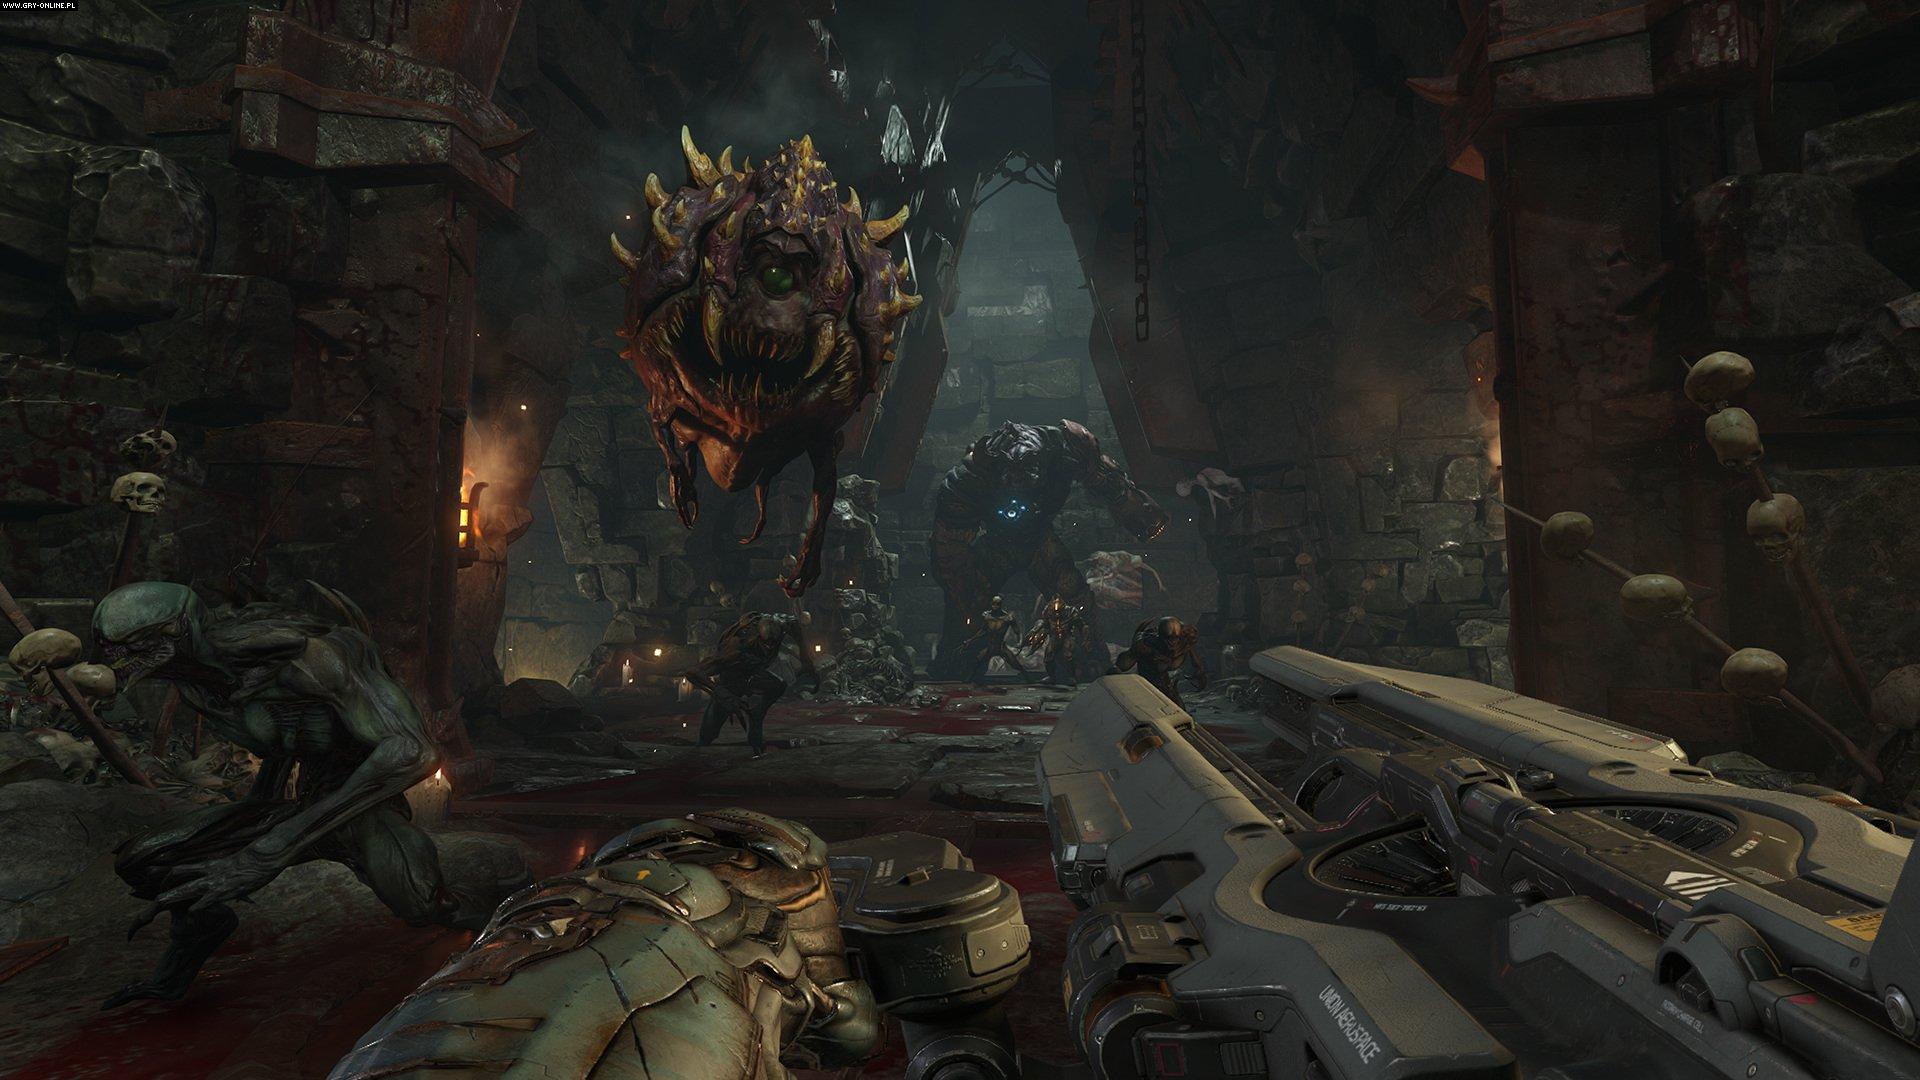 Doom PC, PS4, XONE Games Image 9/39, id Software, Bethesda Softworks